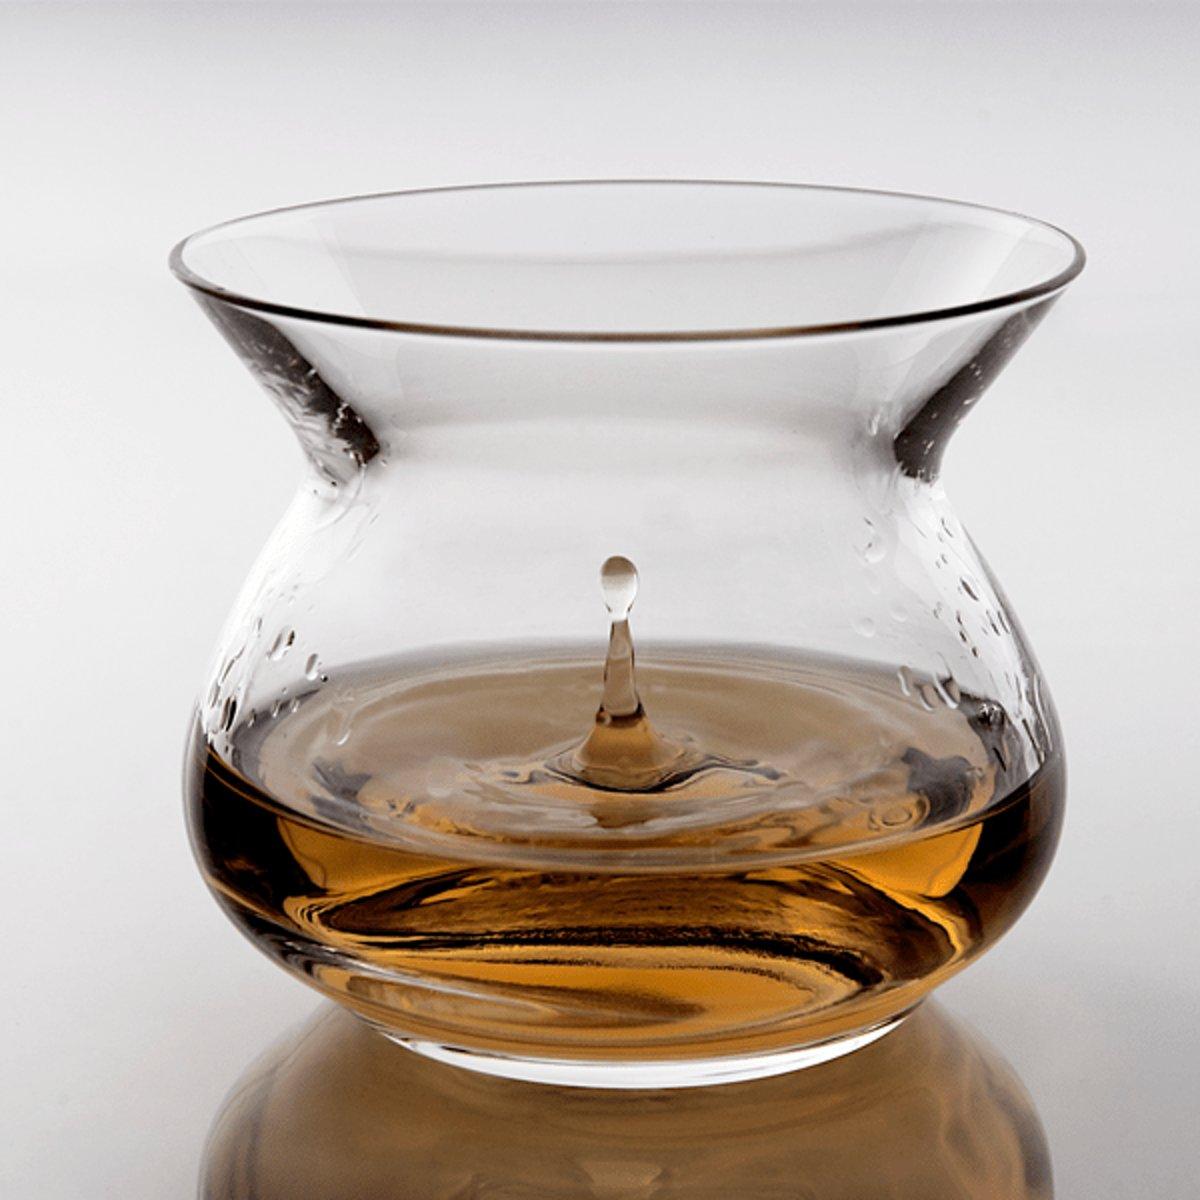 Whisky degustatie glas NEAT 4 stuks kopen